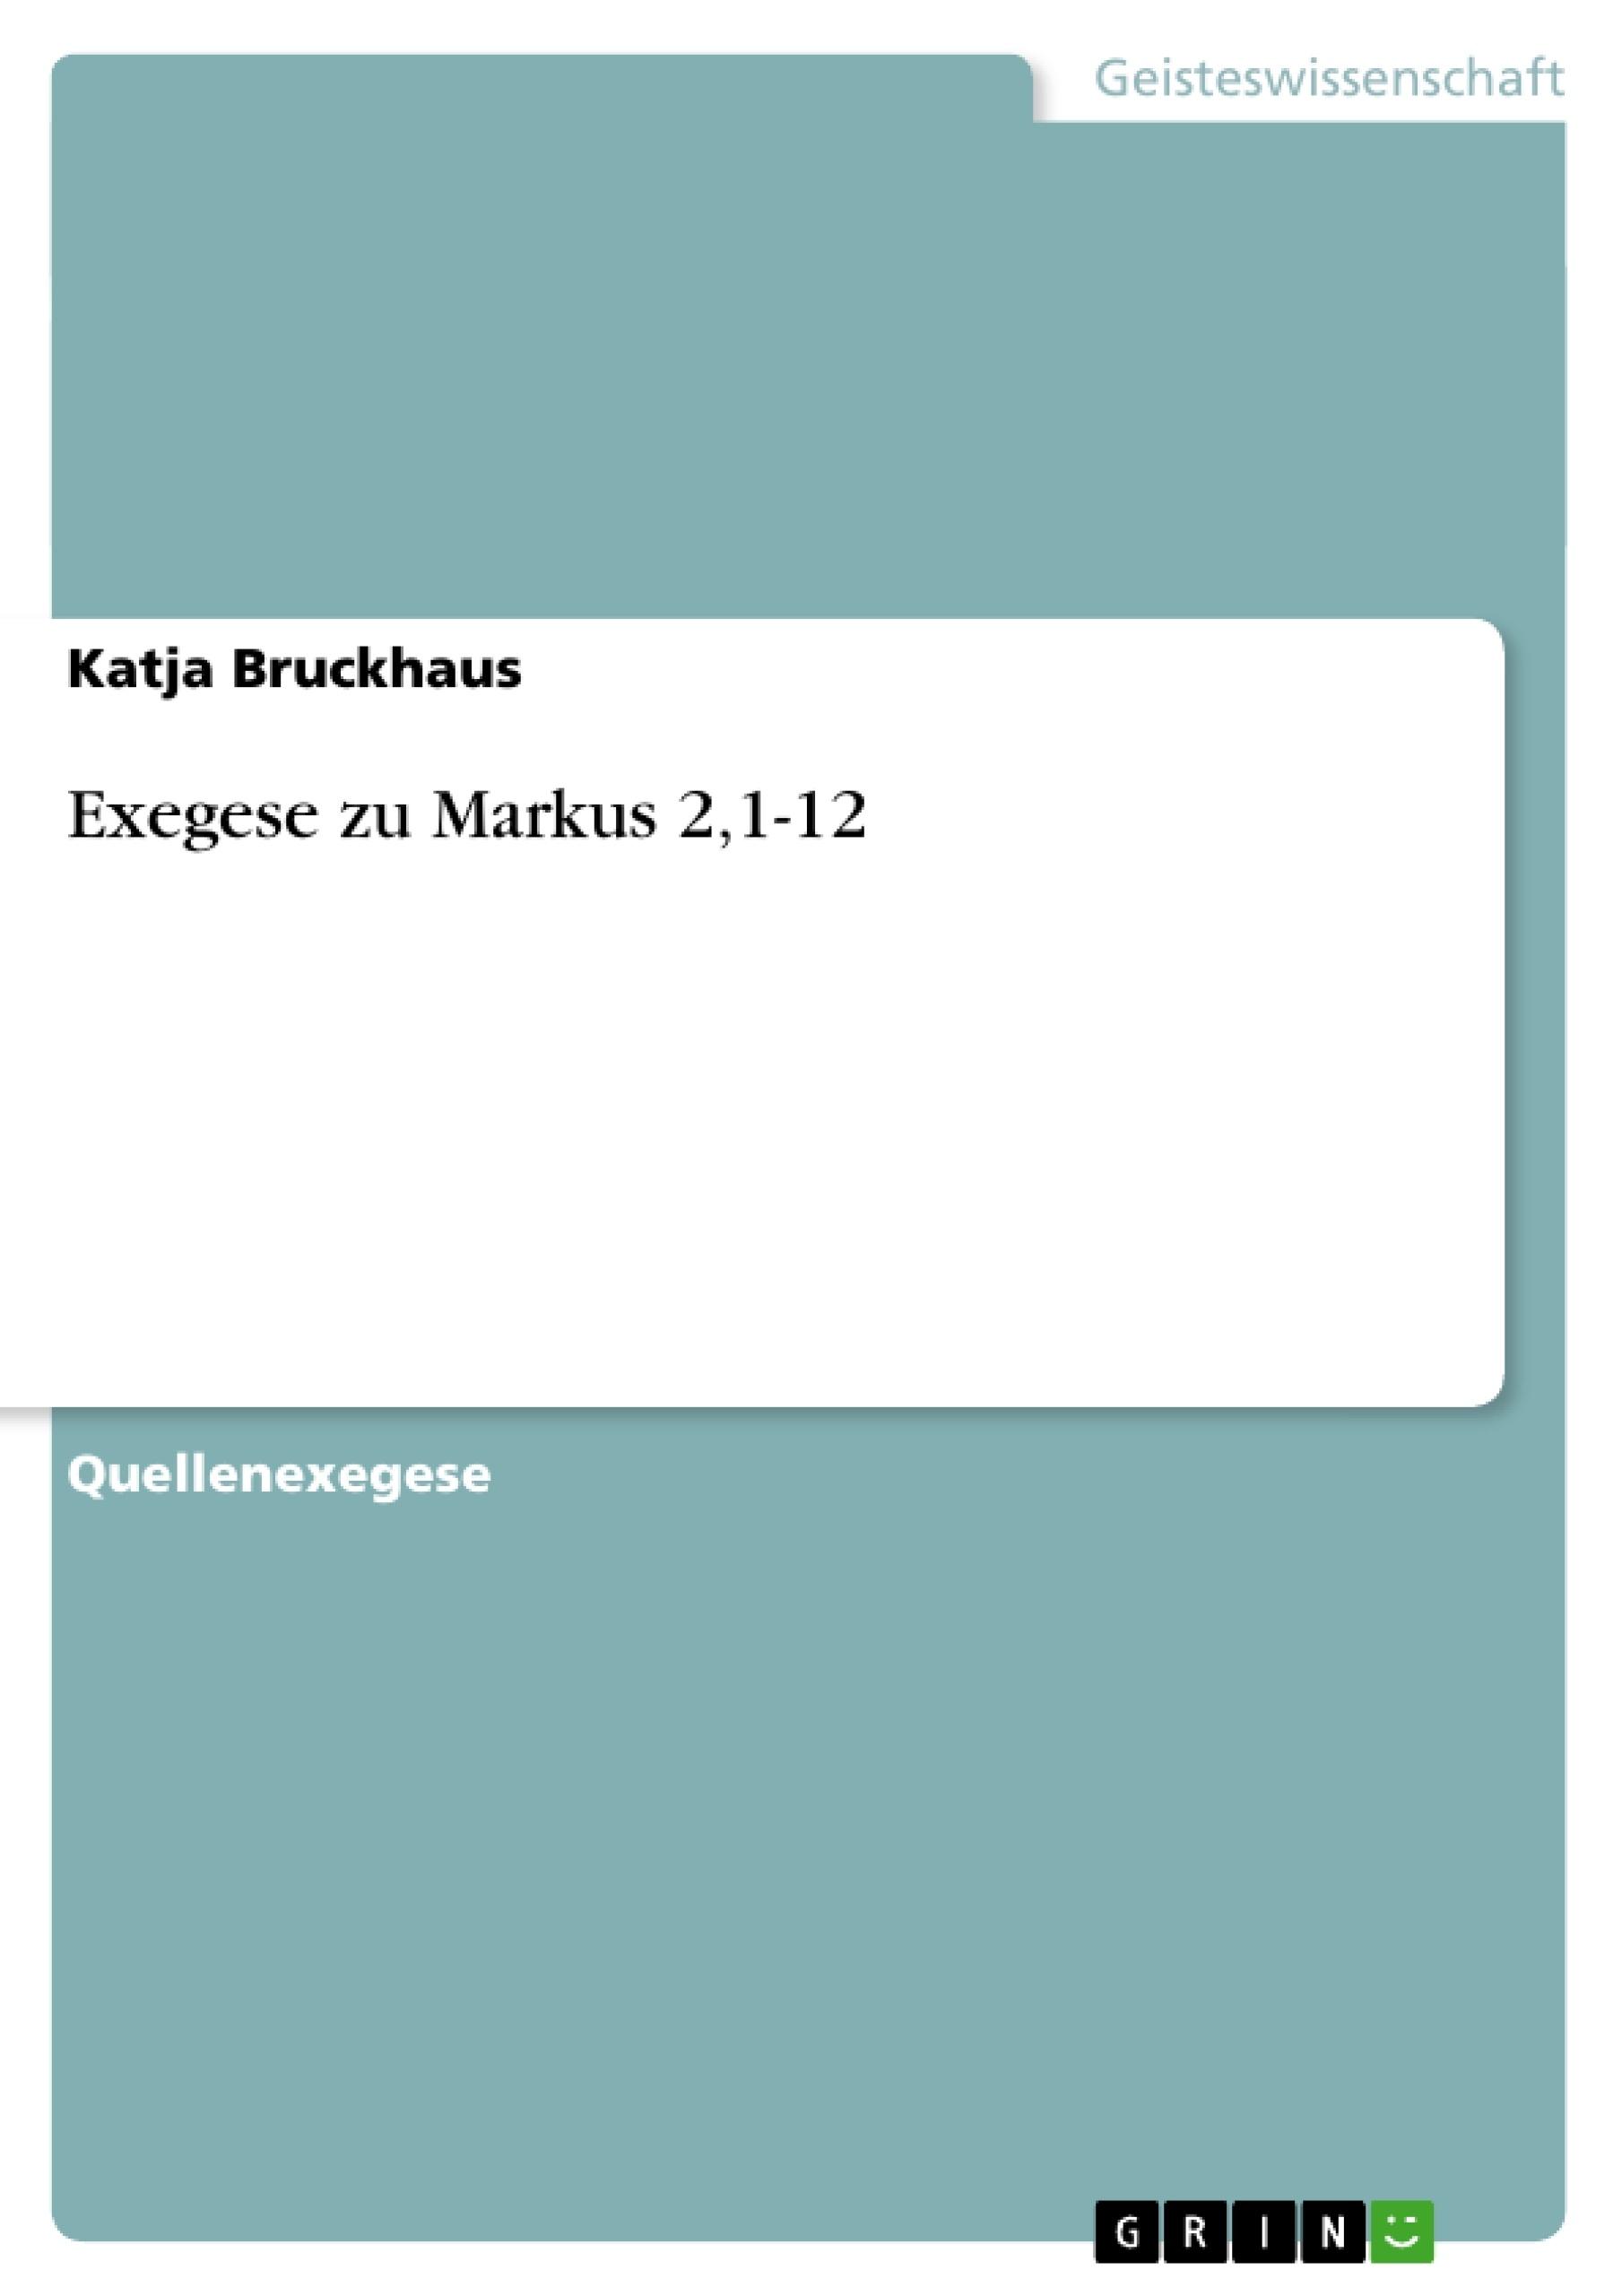 Titel: Exegese zu Markus 2,1-12